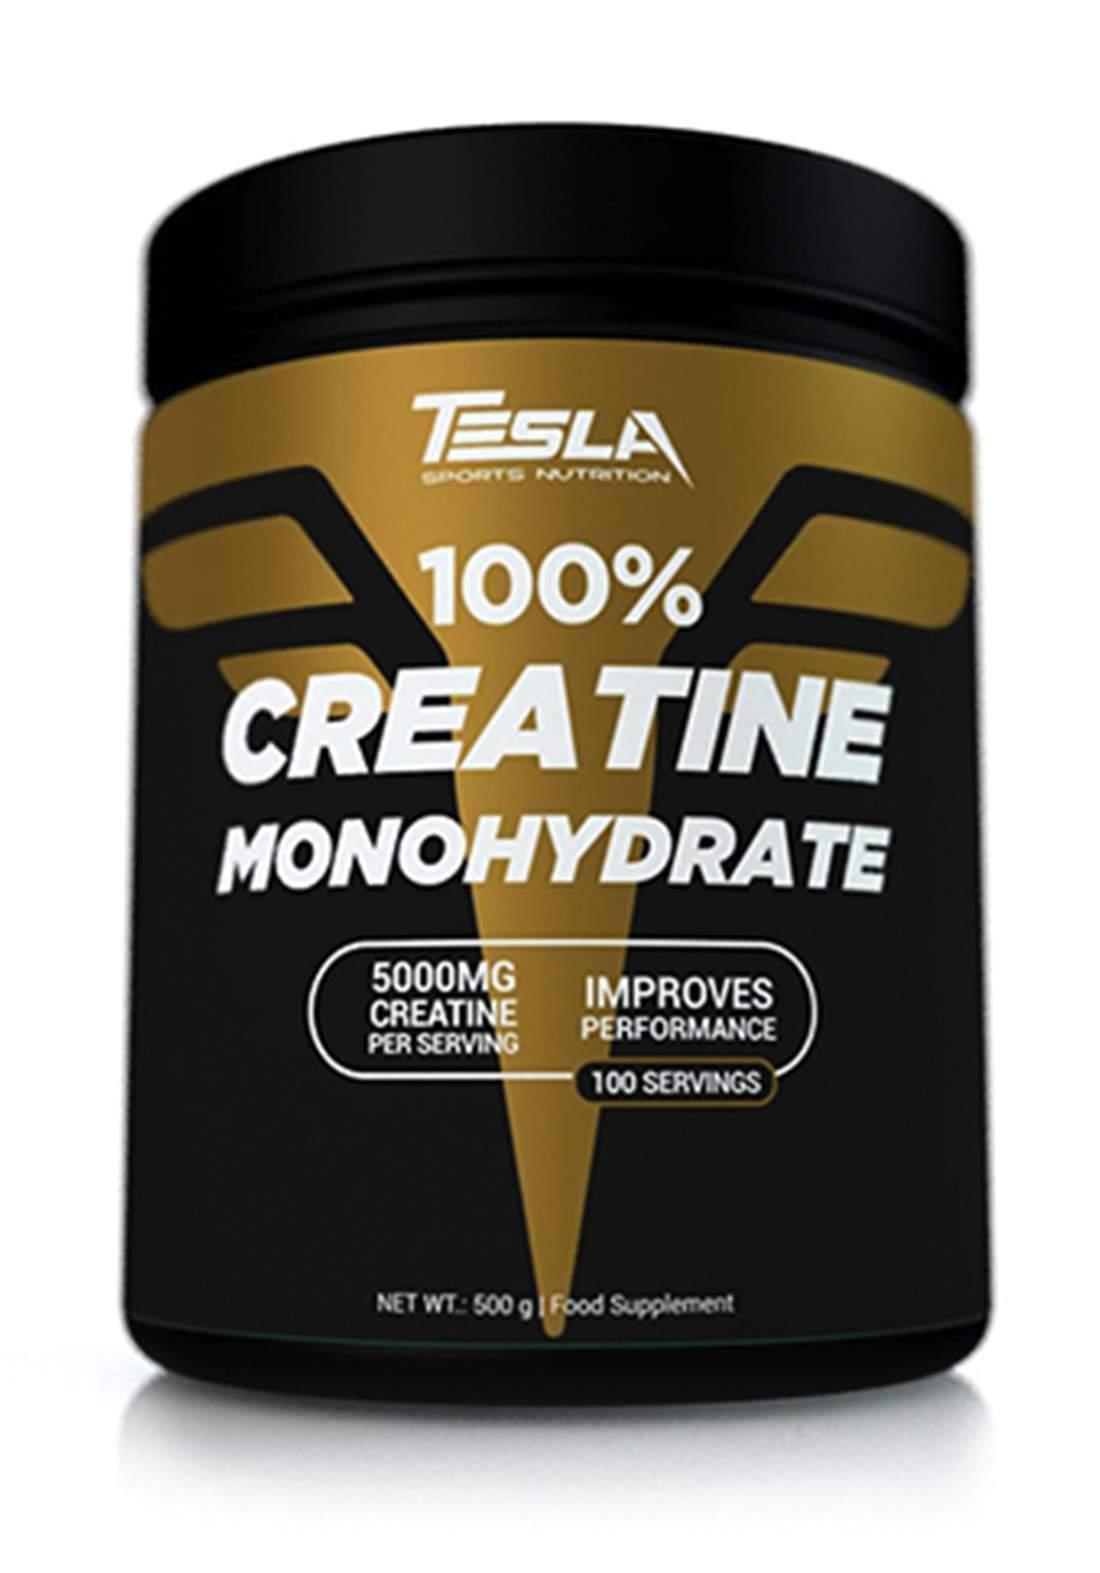 Tesla Sport Nutrition  100% Creatine Monohydrate Powder 100 Serving-5000 mg  مكمل غذائي